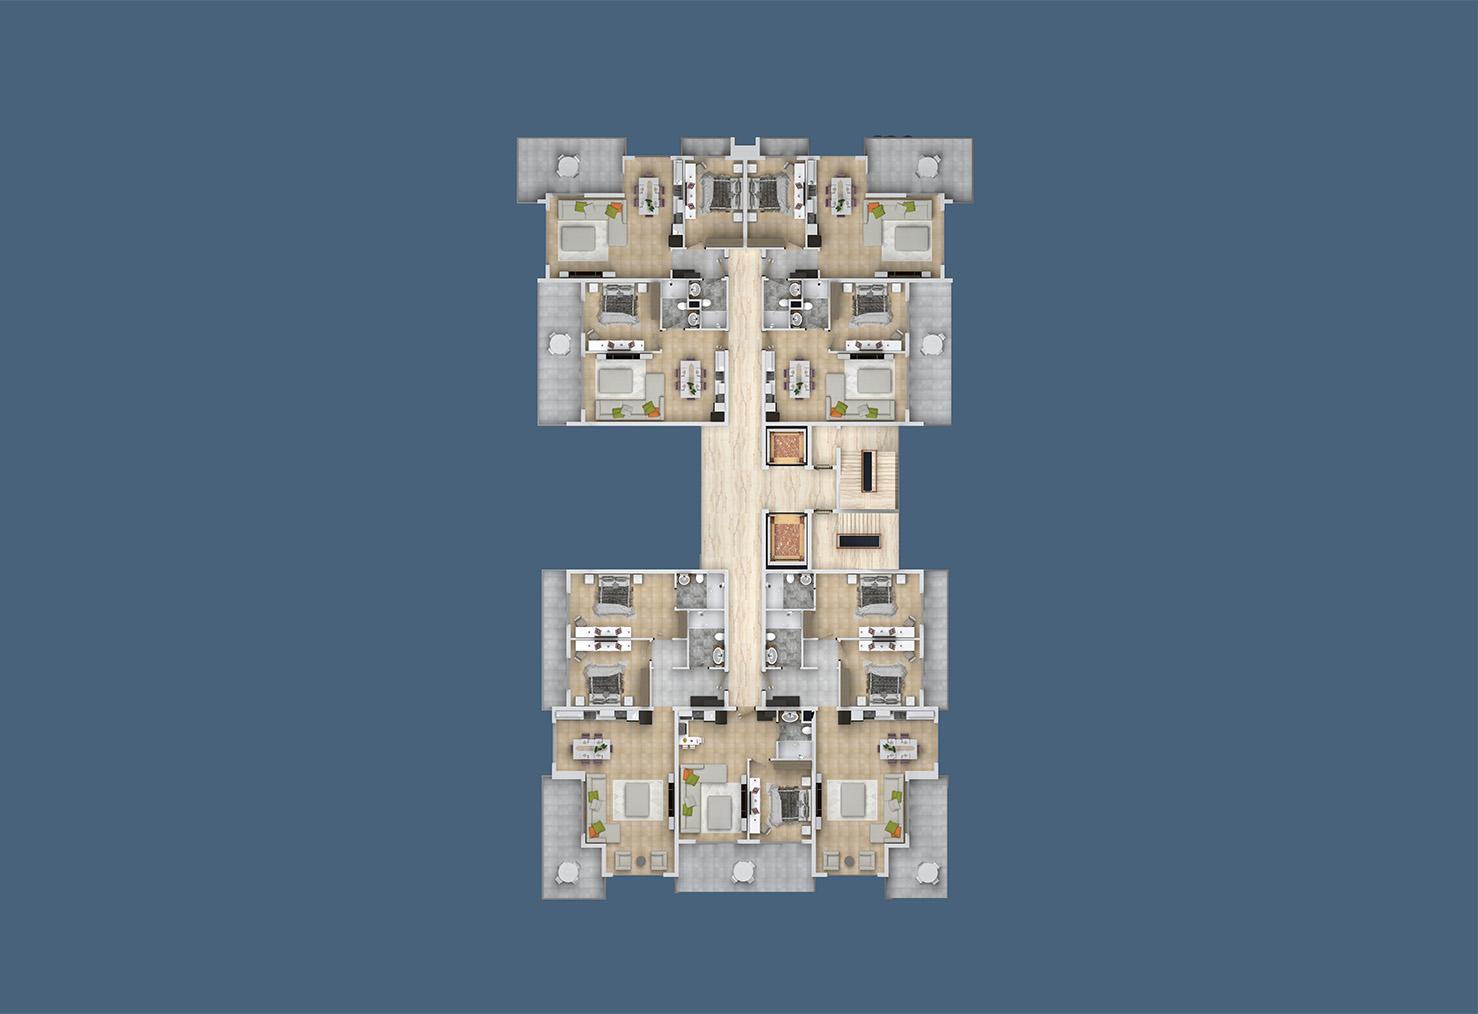 План расположения квартир 11 этаж A Yekta Kingdom Trade Center